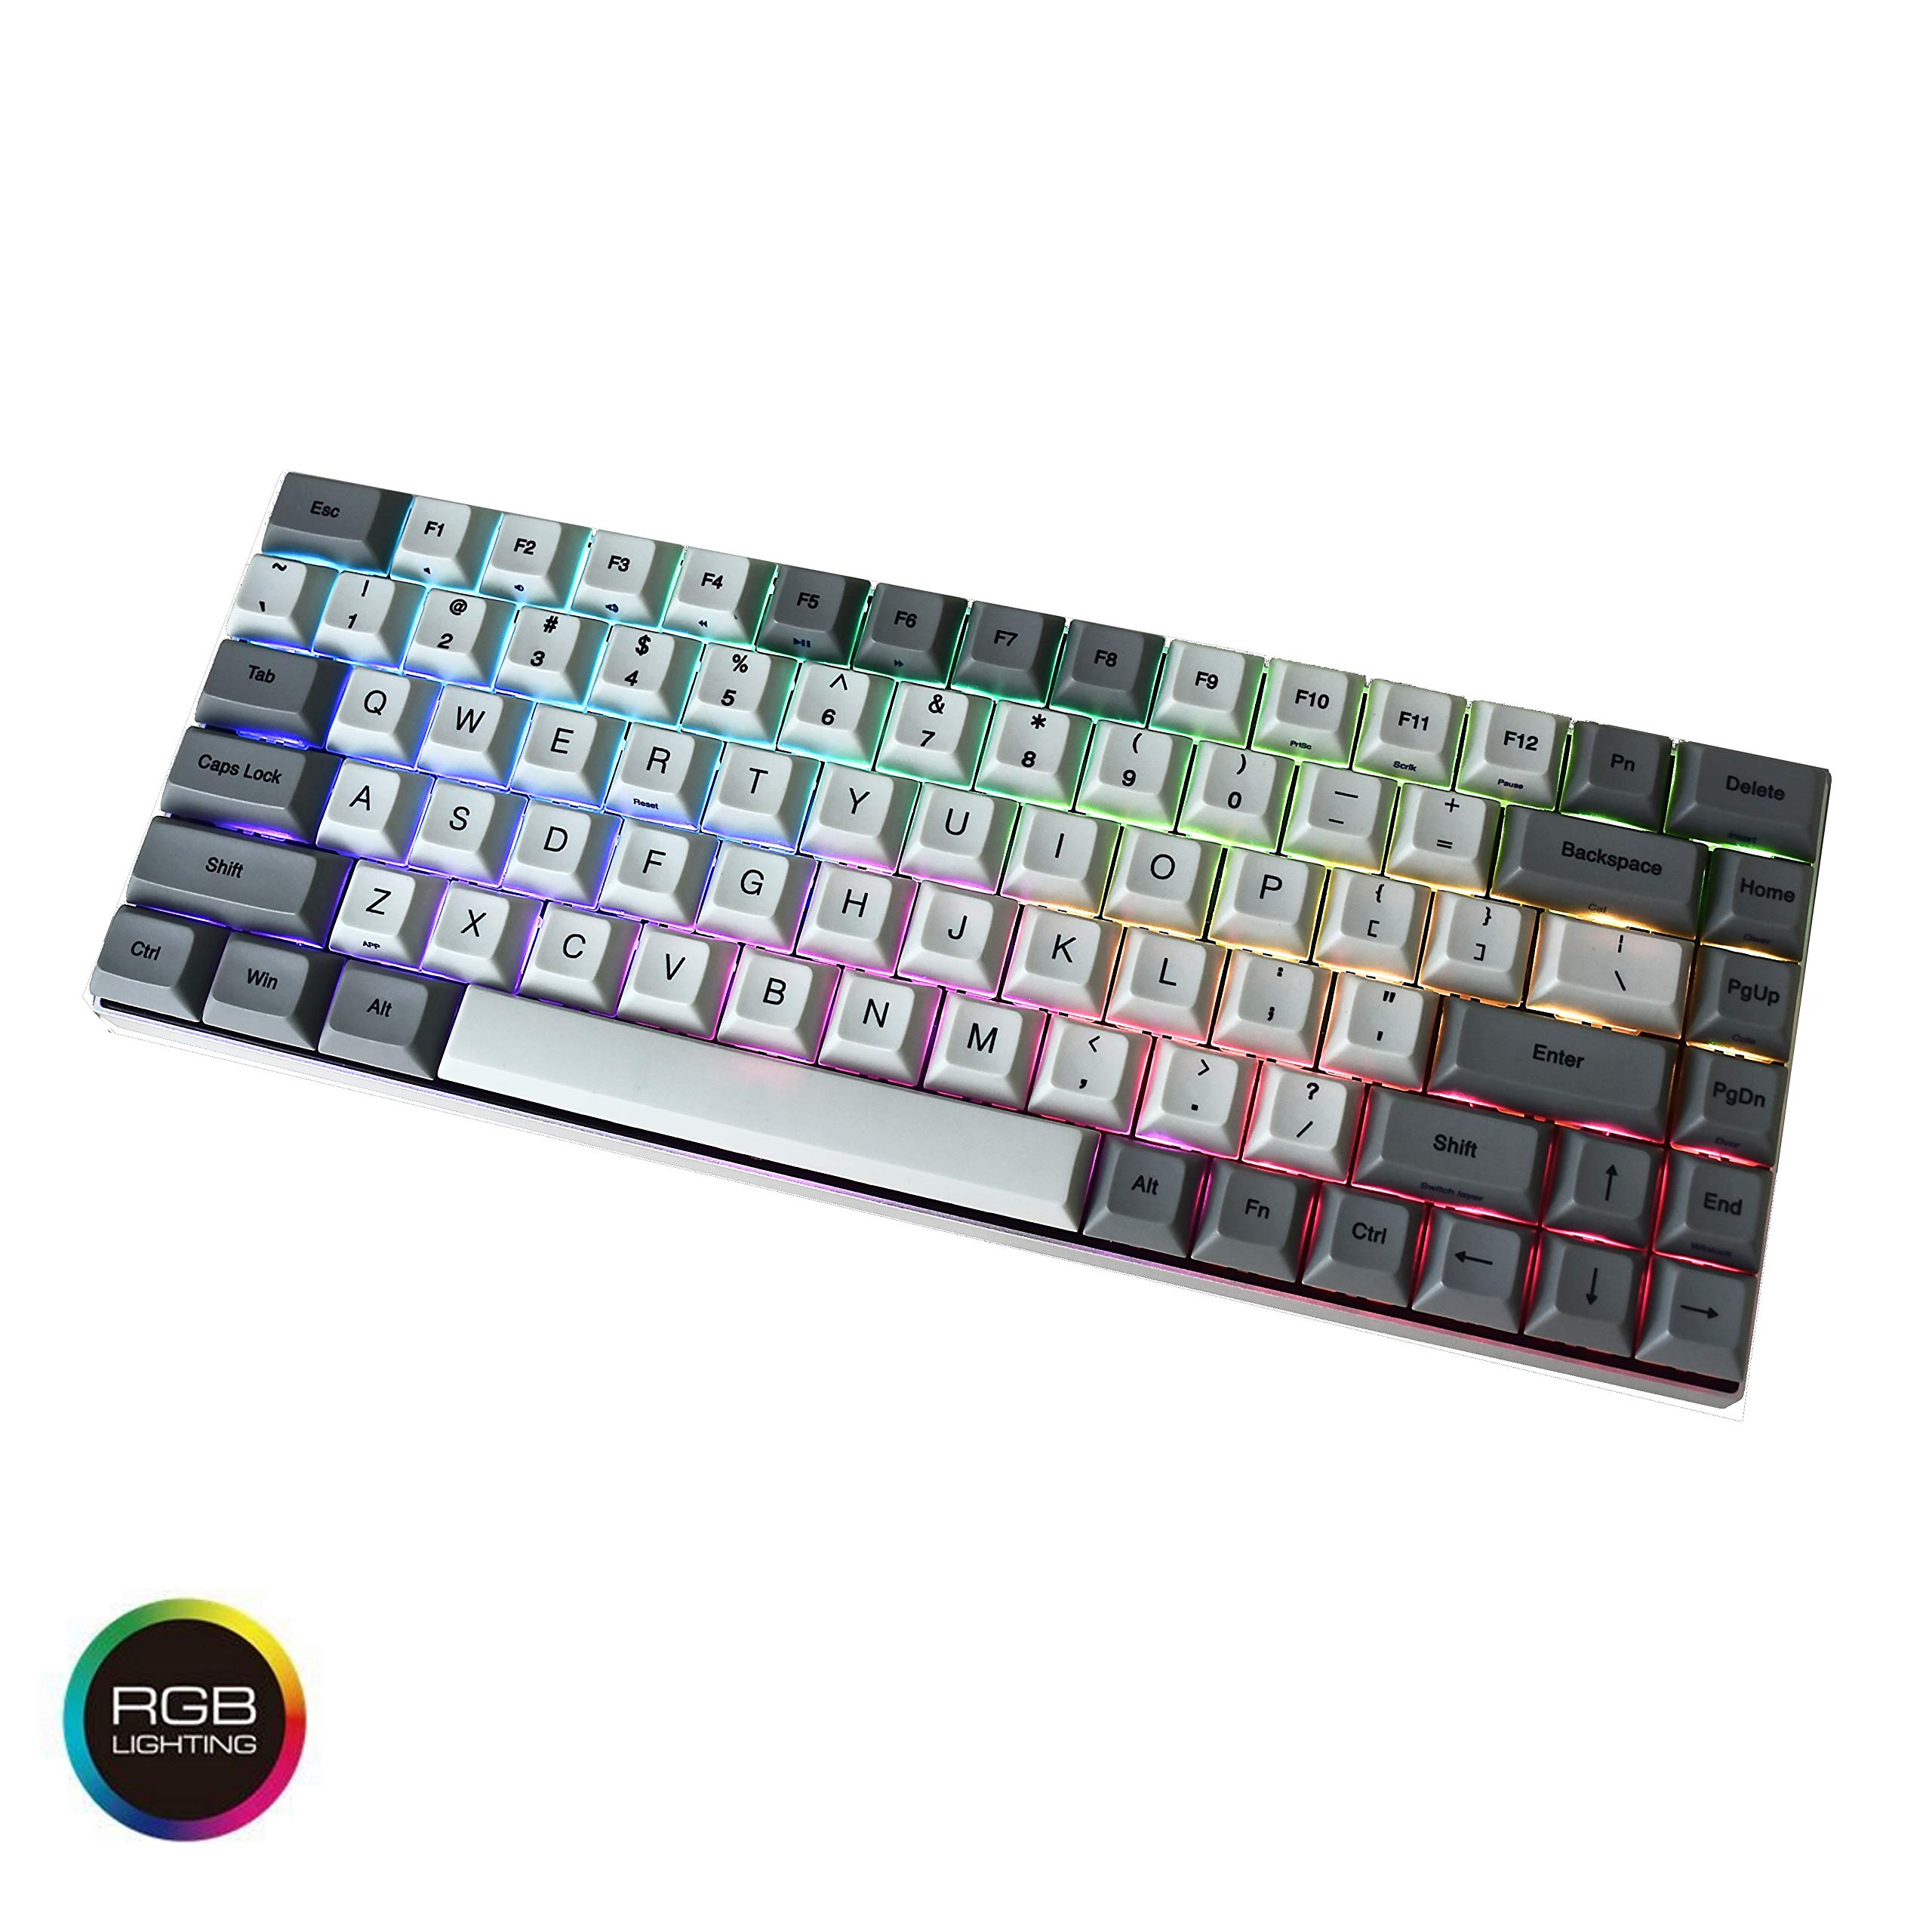 Vortexgear Race 3 RGB Backlit - PBT DSA Dye Sub Keycaps - 75% Size TKL Programmable Mechanical Gaming Keyboard - (Grey CNC Aluminium Casing) RGBY Modifiers - USB 2.0 (Cherry Mx RGB Brown)